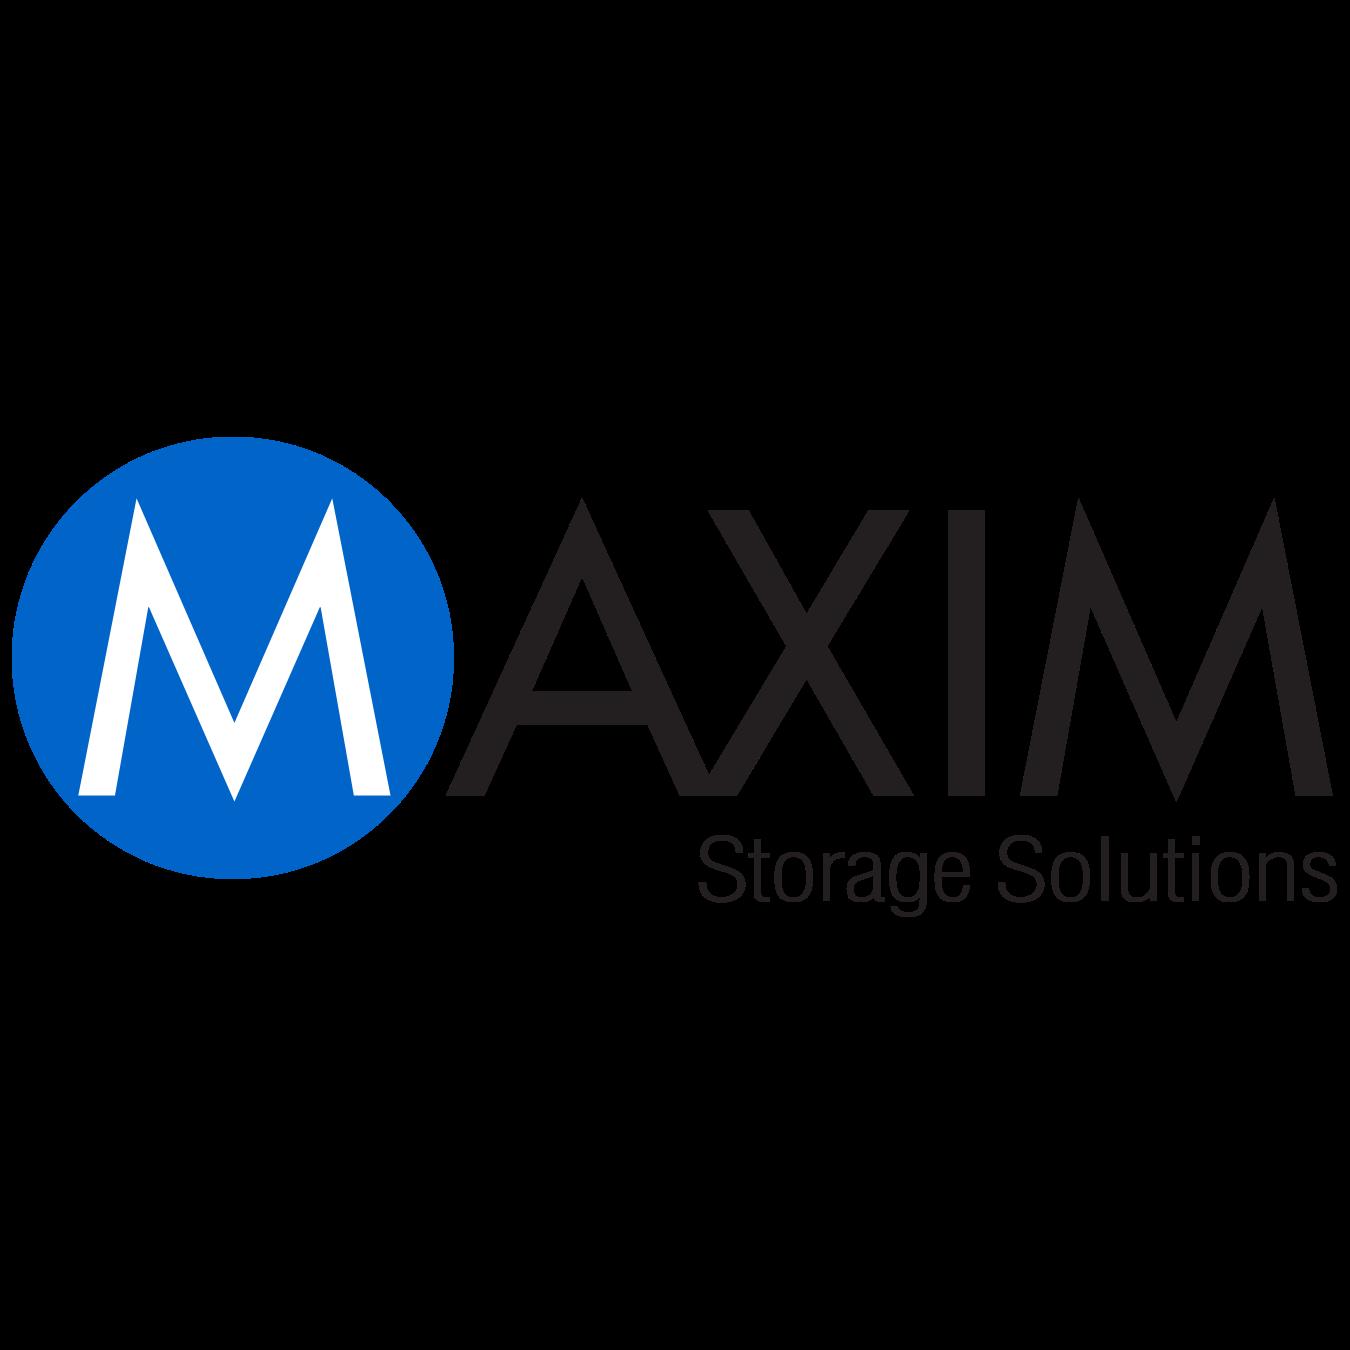 Maxim Storage Solutions